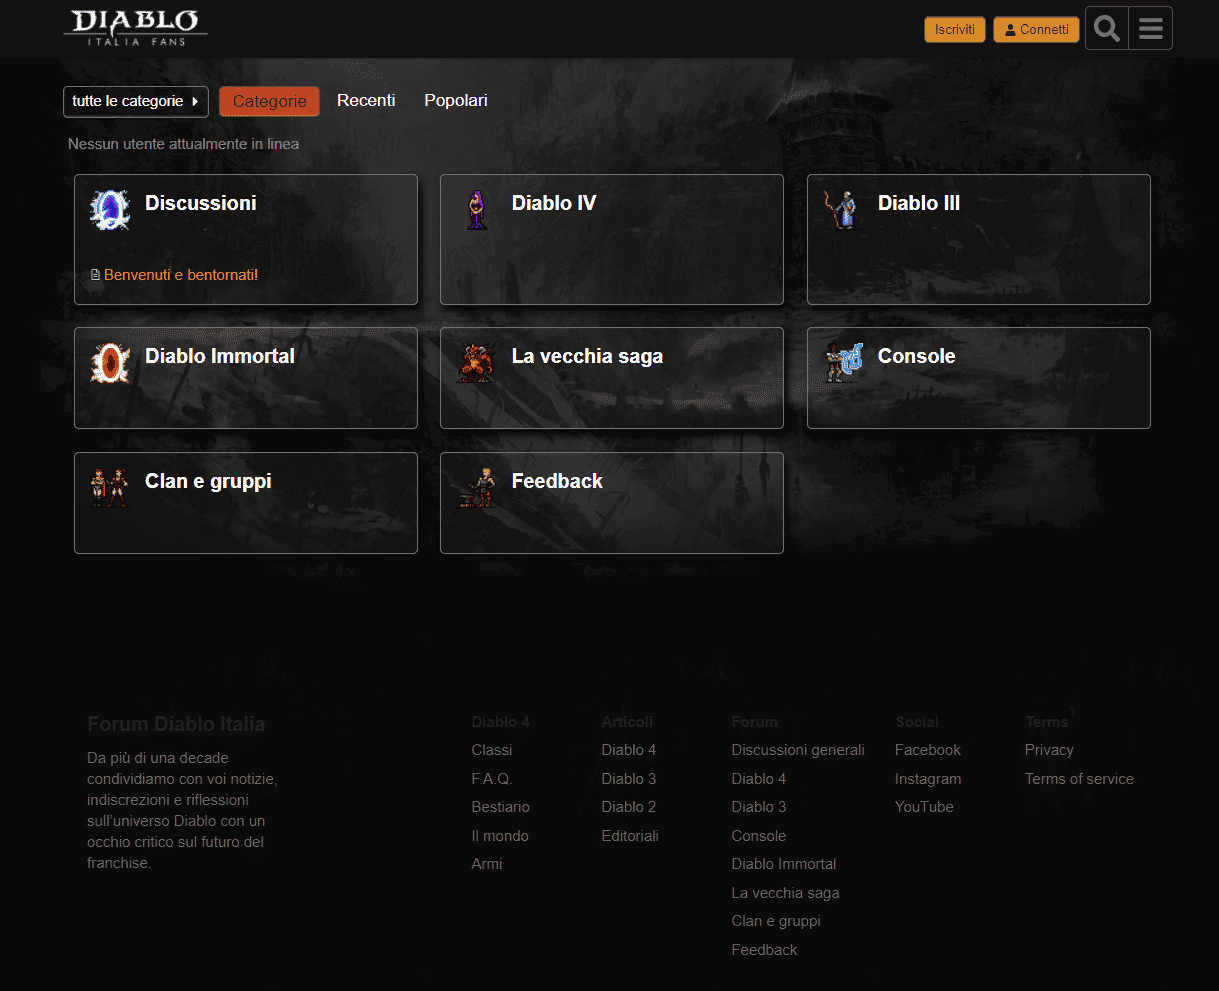 schermata iniziale forum diablo italia fans